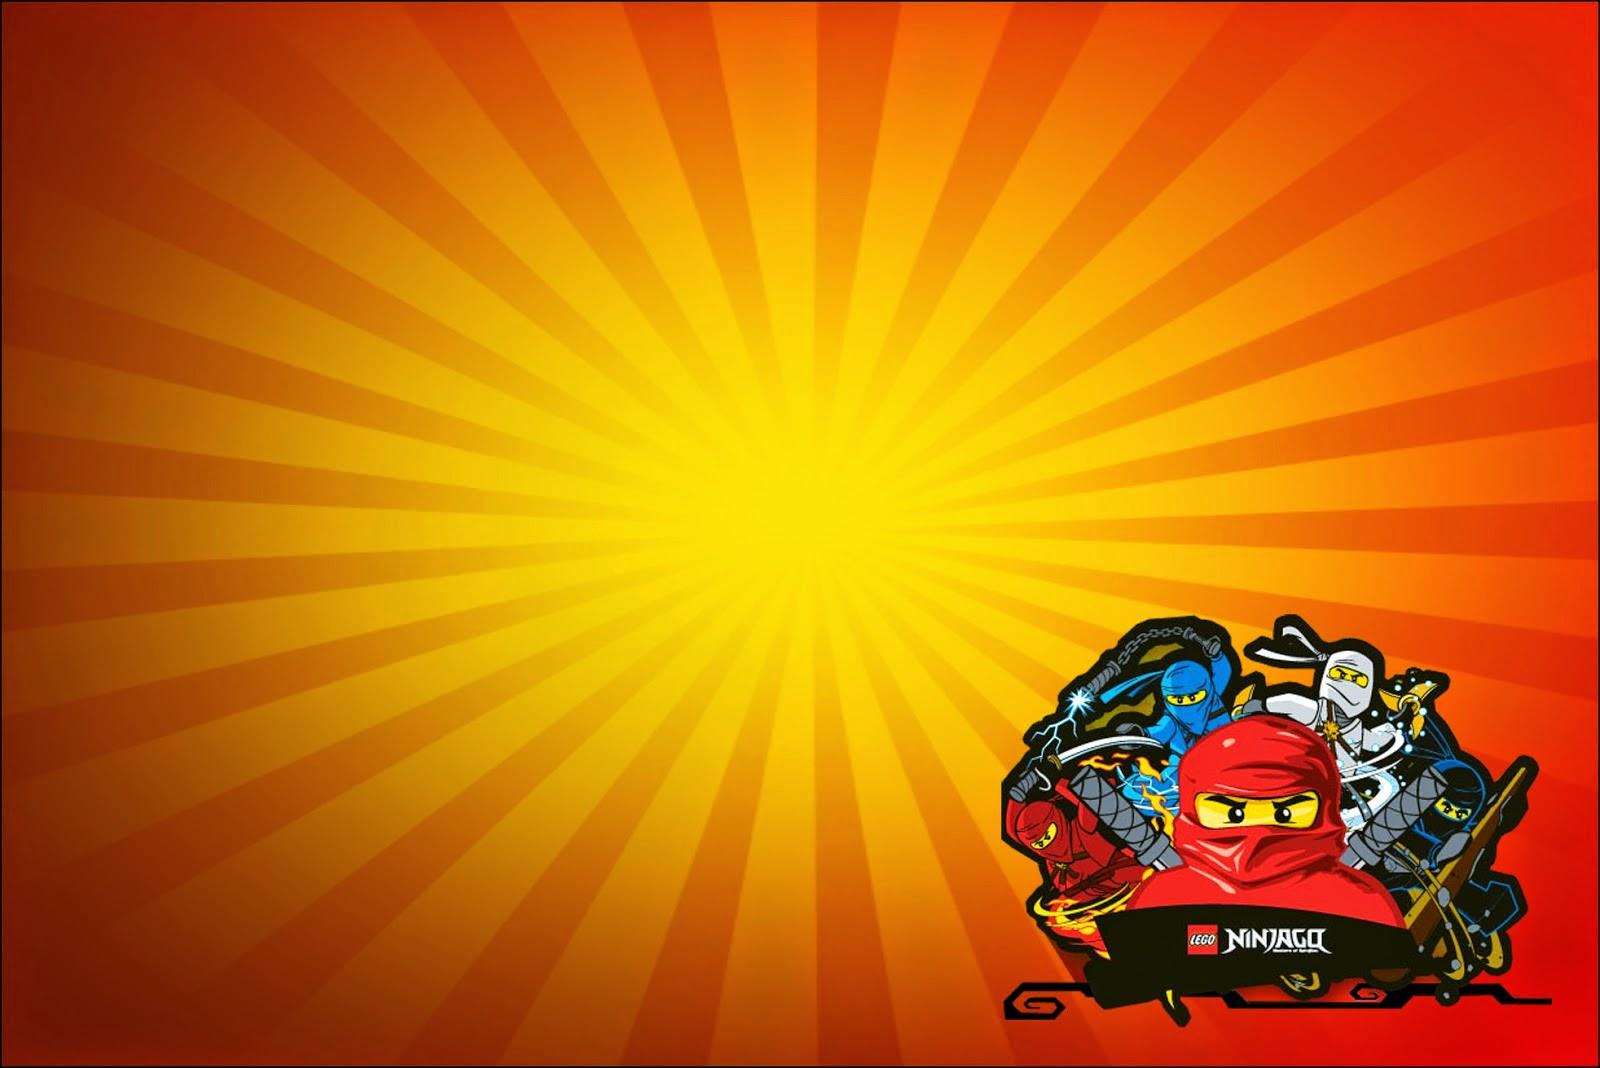 Ninjago Free Printable Invitations Oh My Fiesta for Geeks